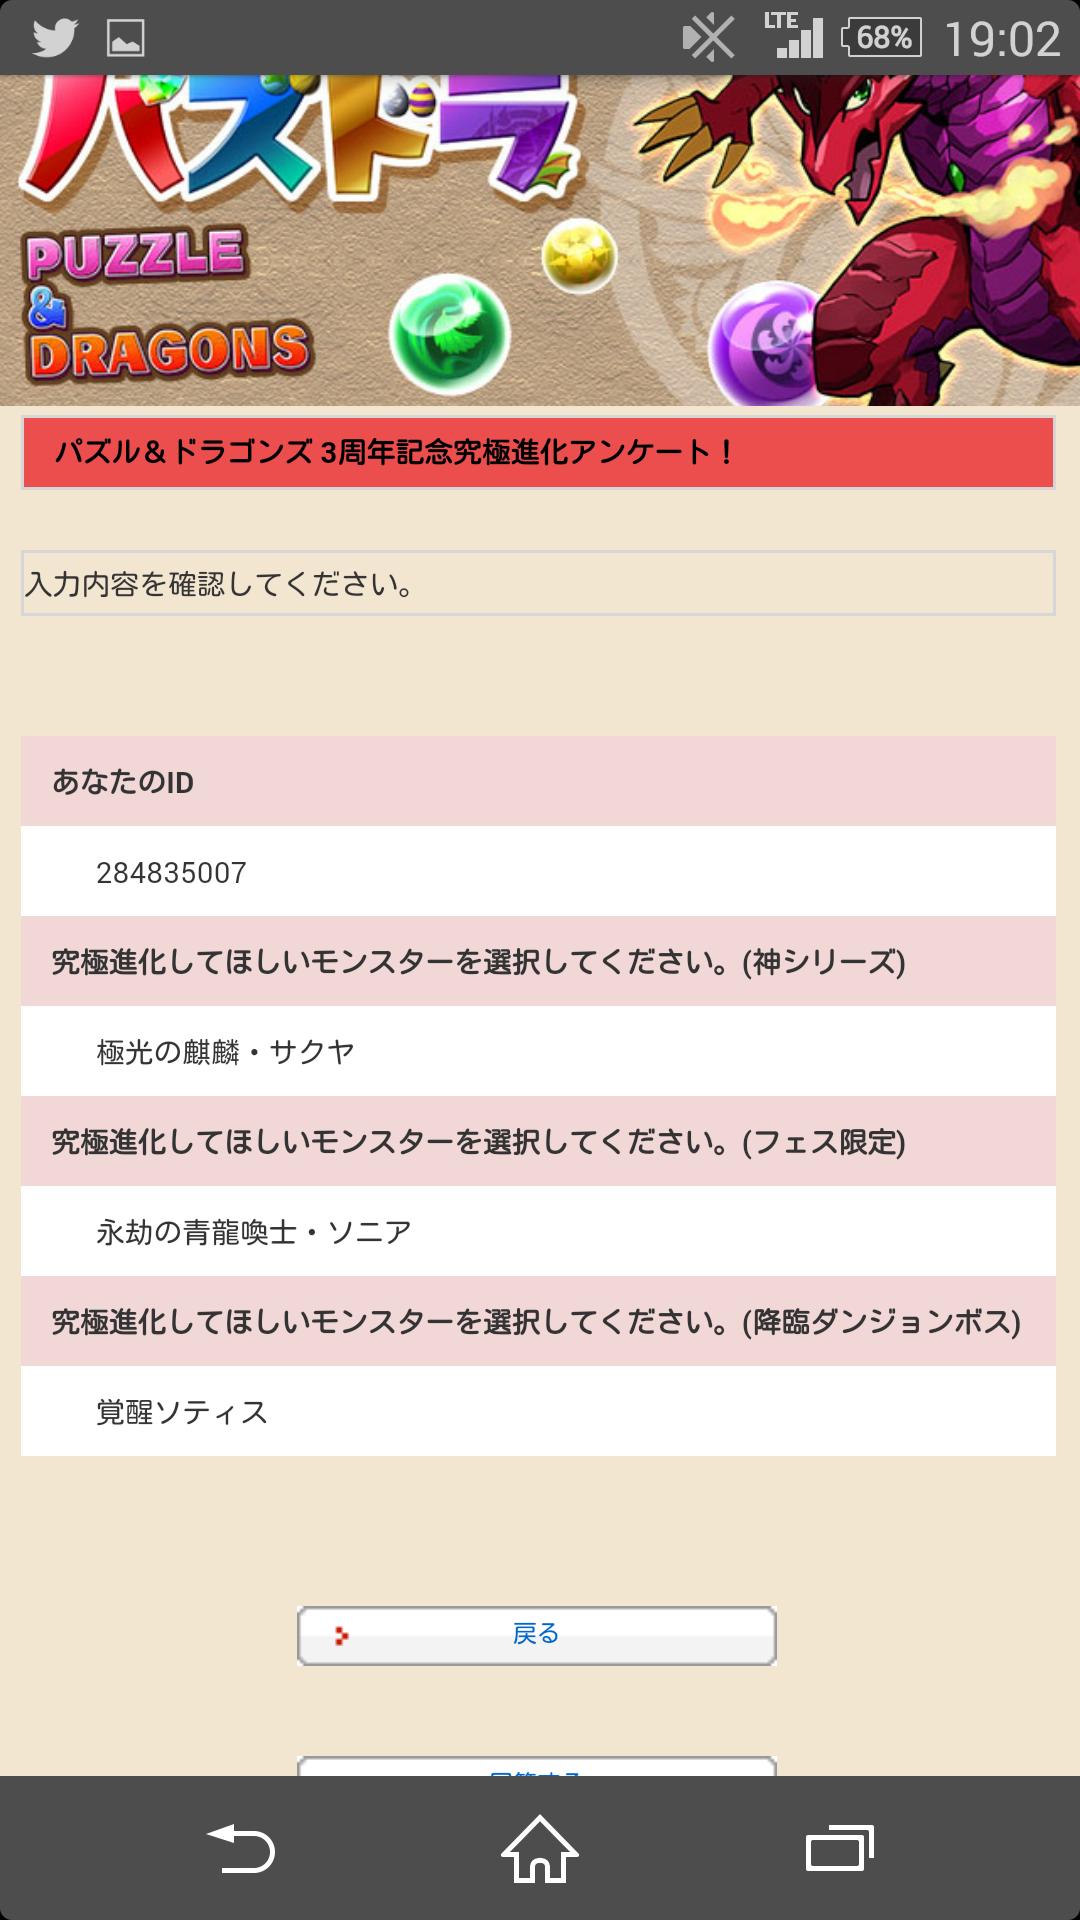 Screenshot_2015-02-11-19-02-37.png